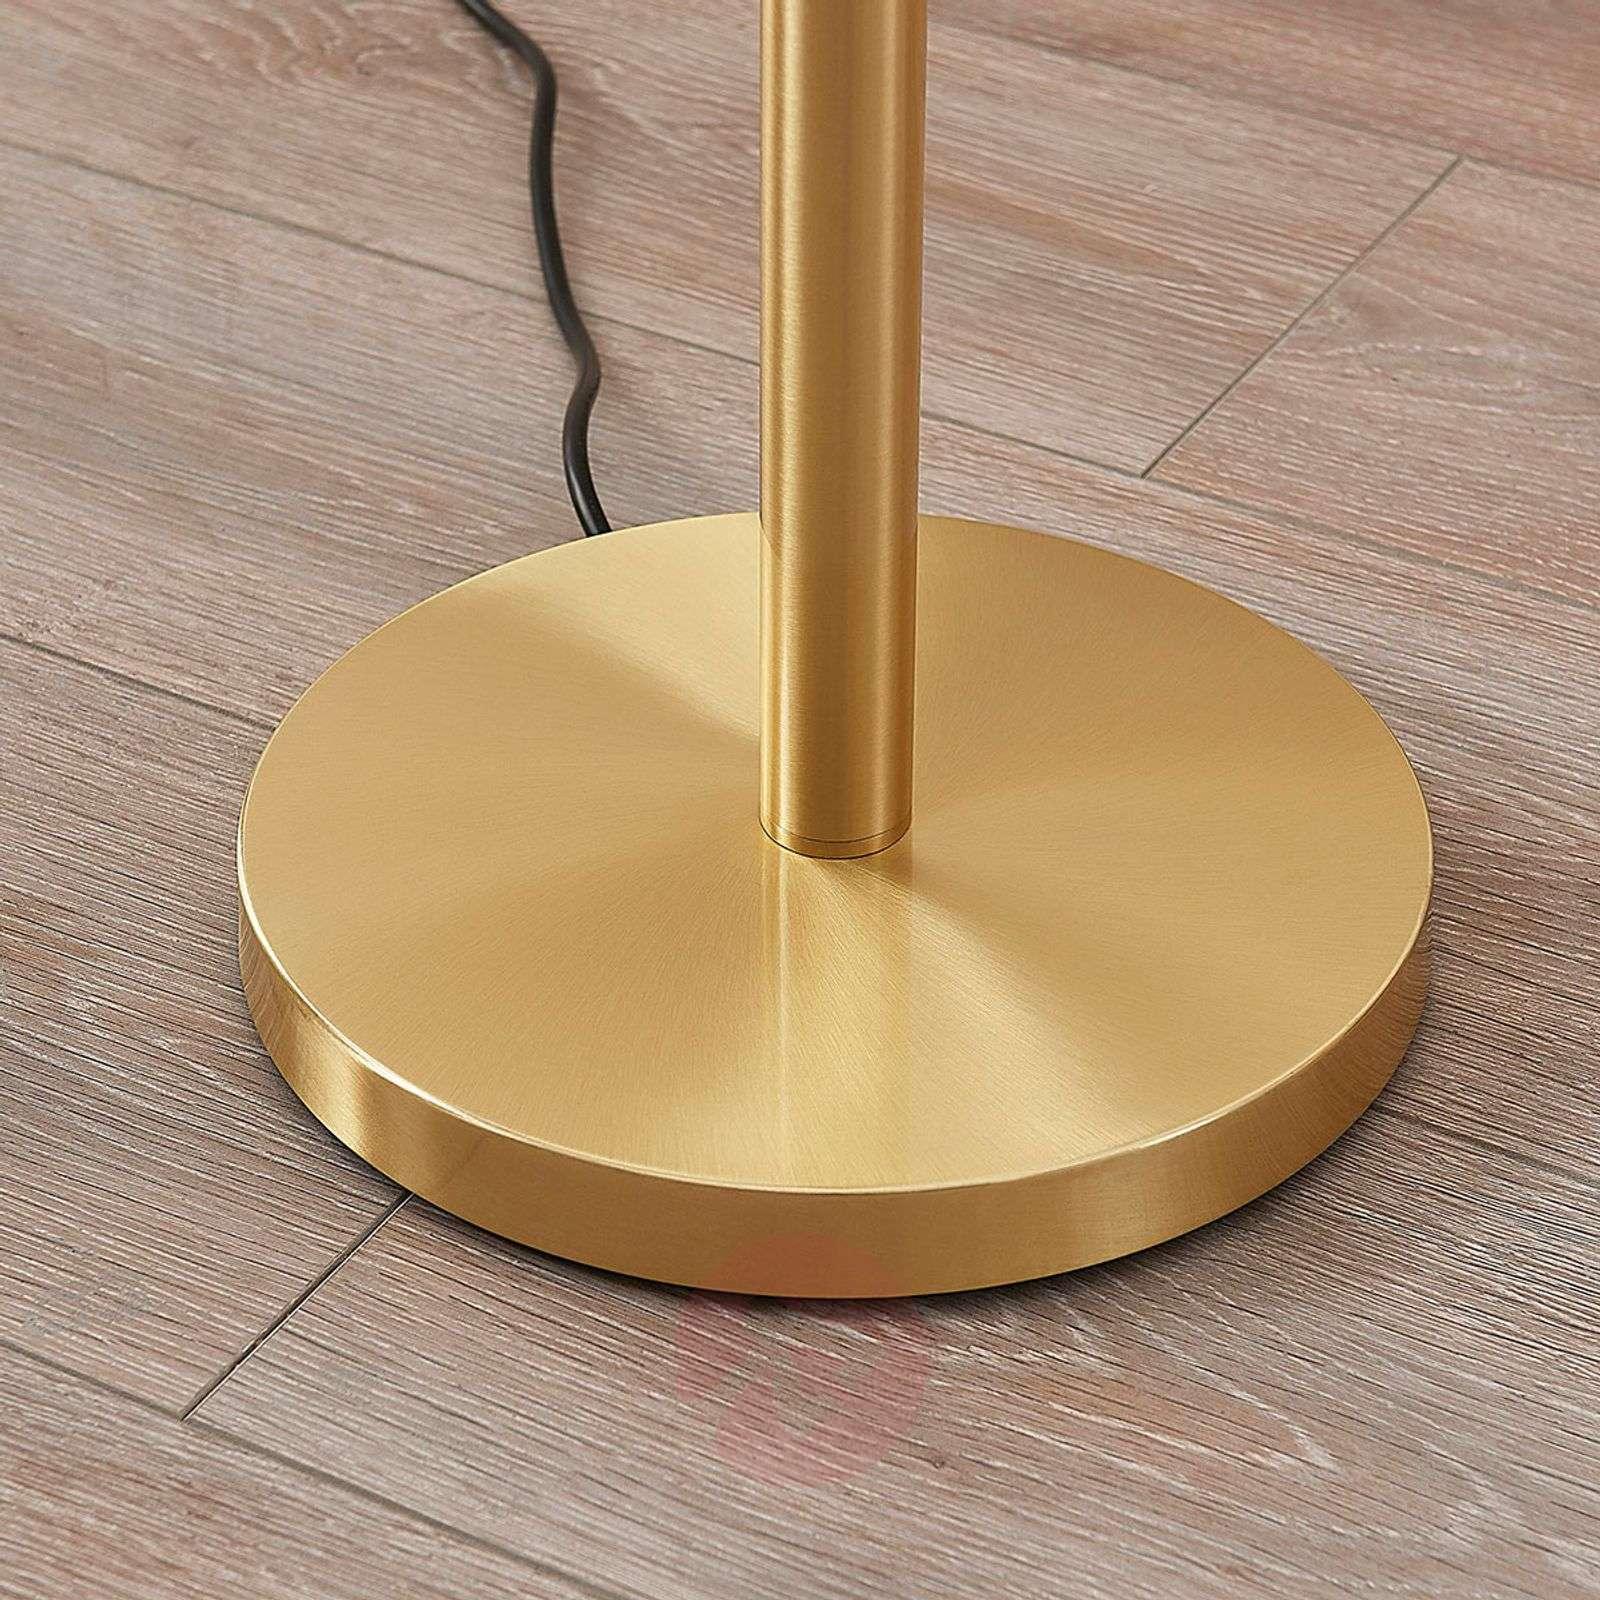 Brass-coloured LED uplighter Ignacia-9621679-02